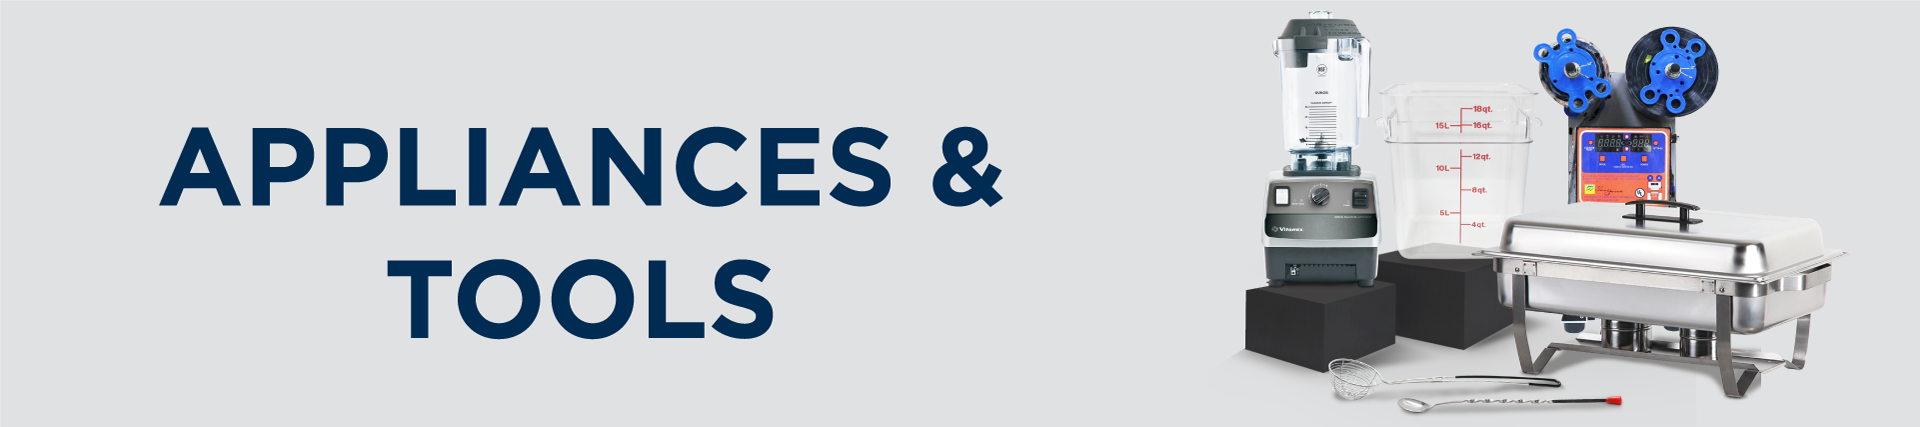 Appliances & Tools